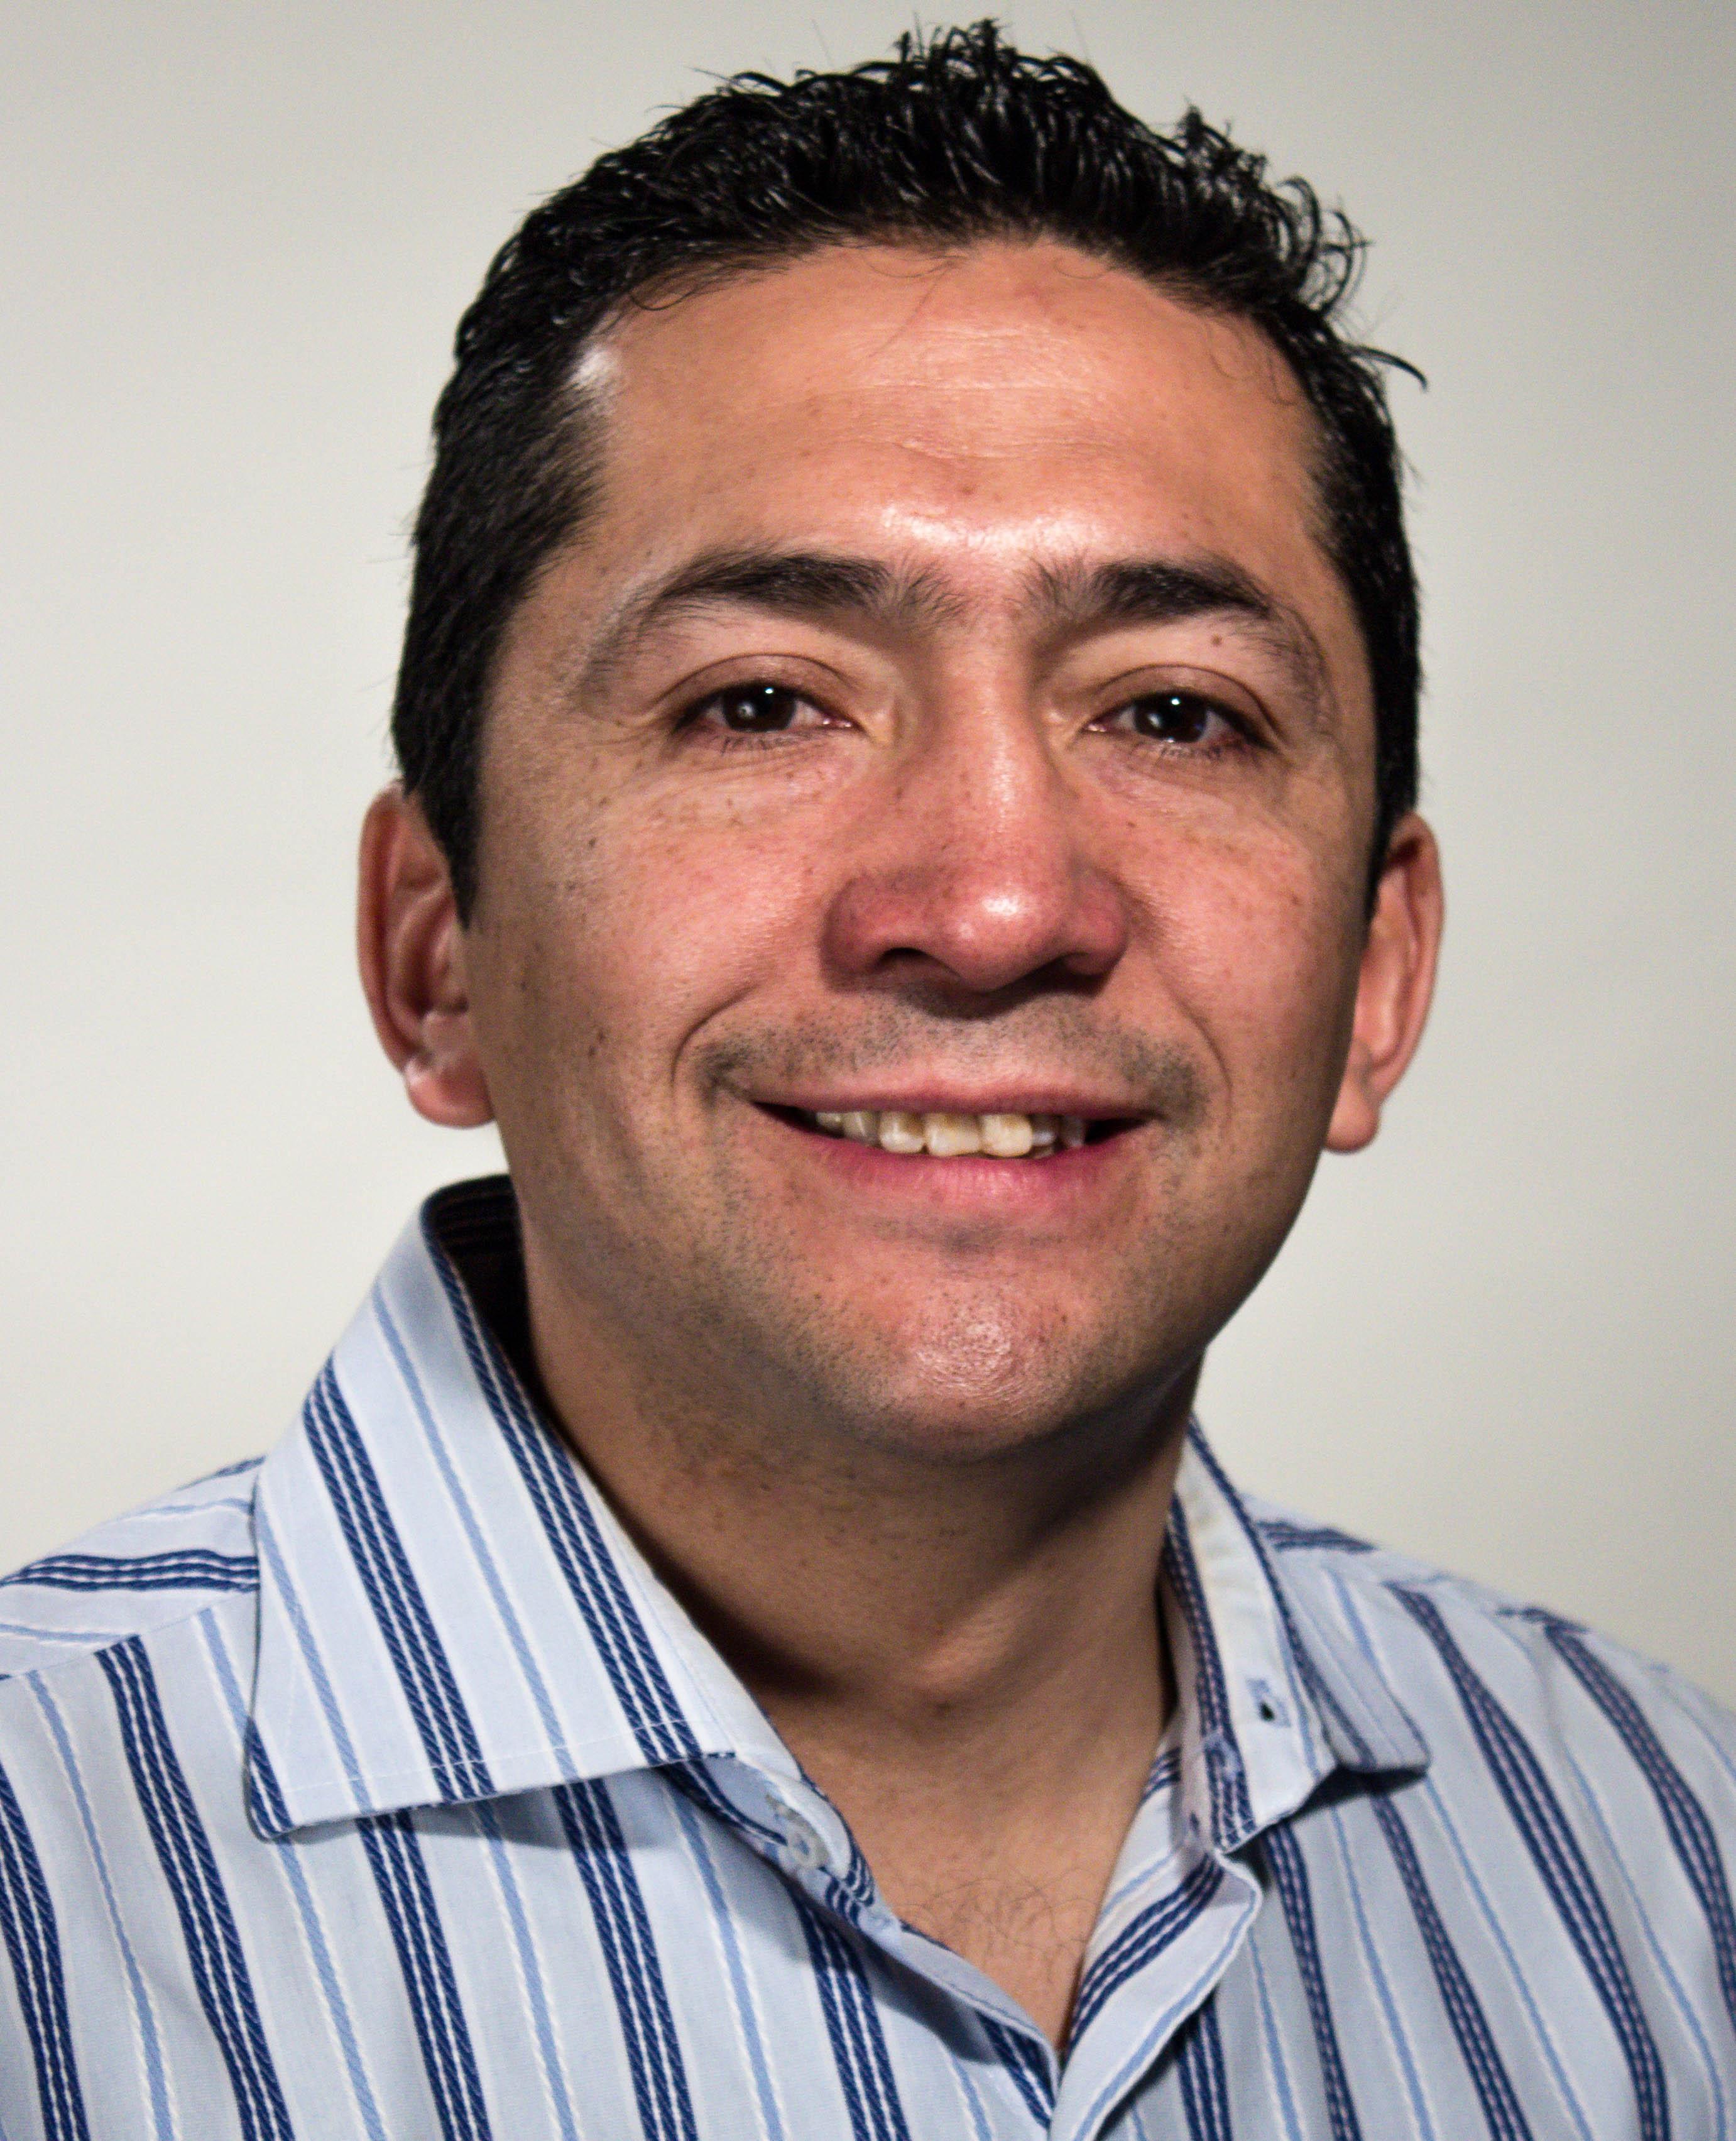 Saul Garcia